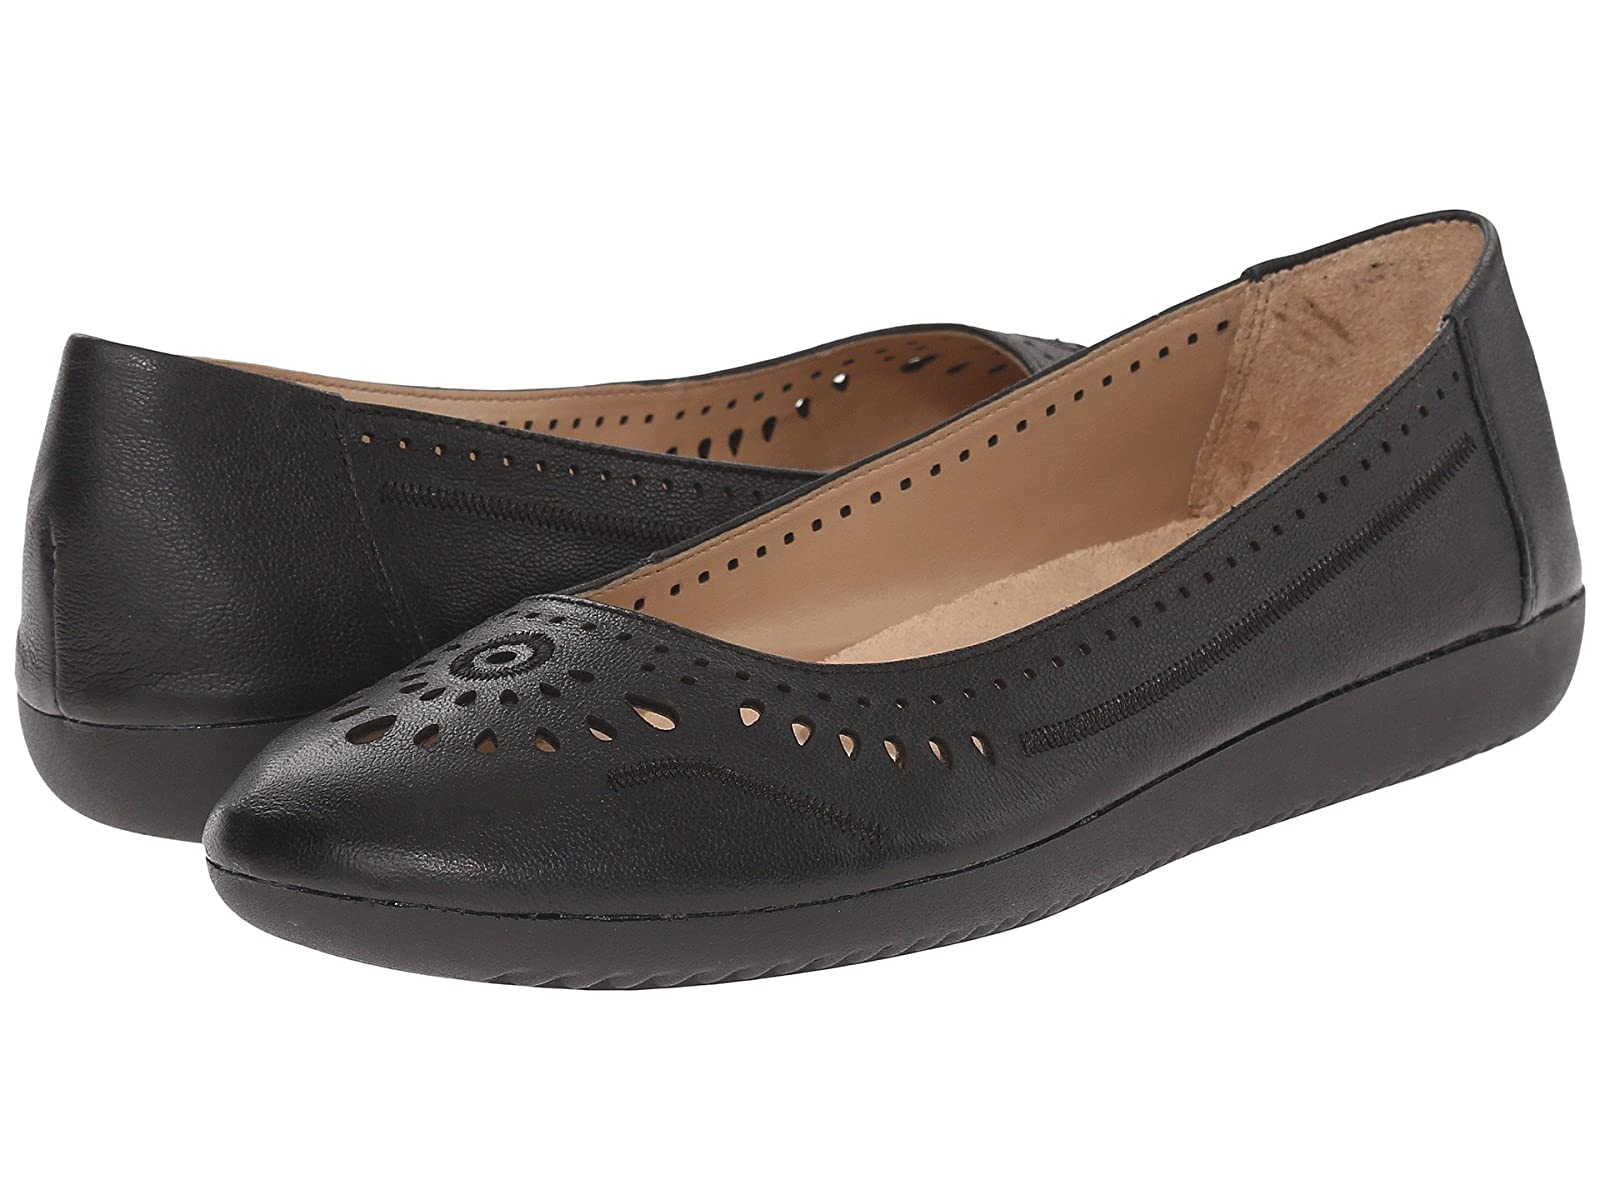 Naturalizer KanaCheap and distinctive eye-catching shoes